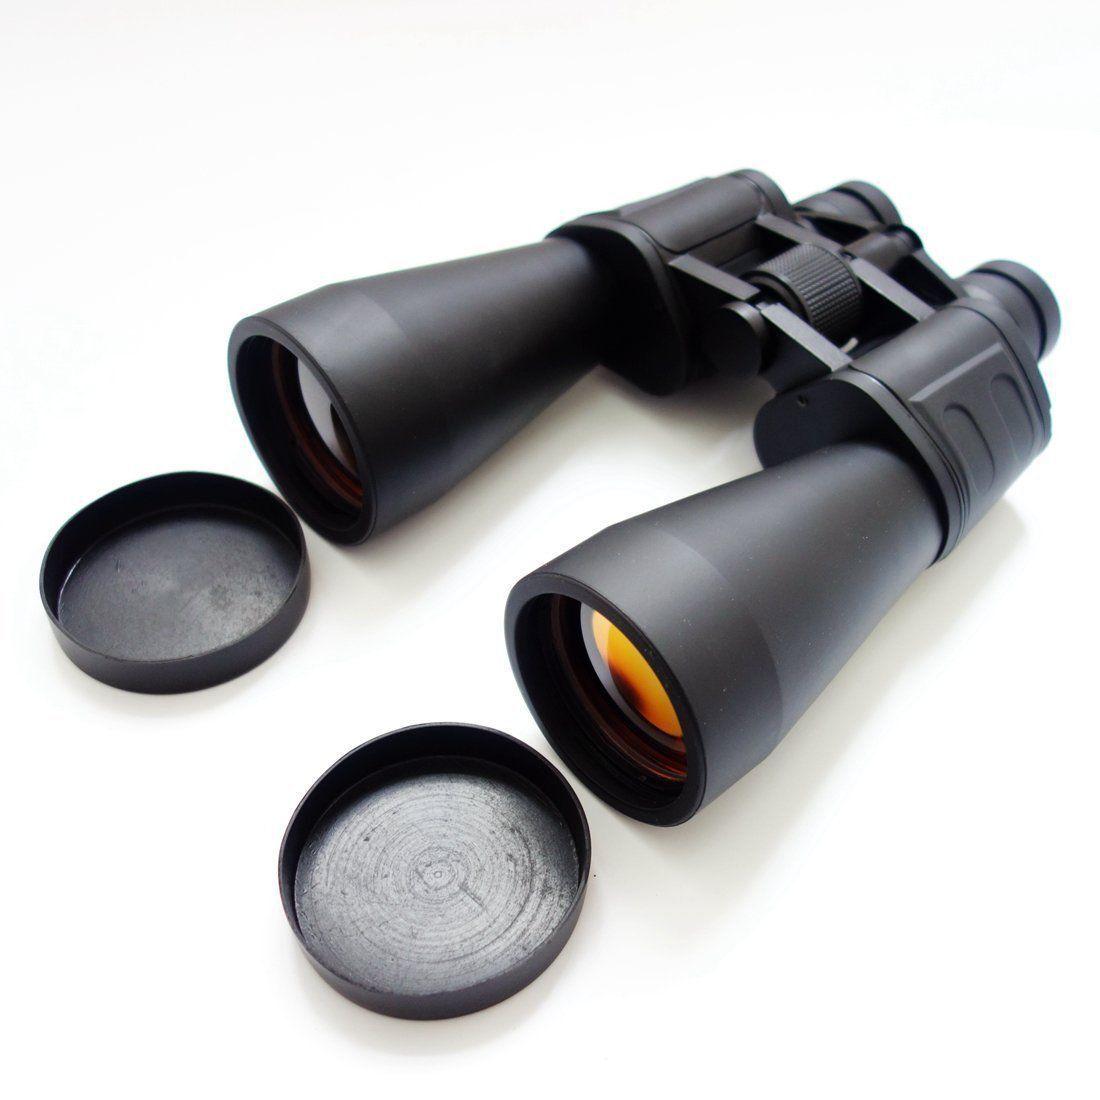 SAKURA Day And Night Vision 20 x 180 x 100 ZOOM Powerful Binoculars UK Seller